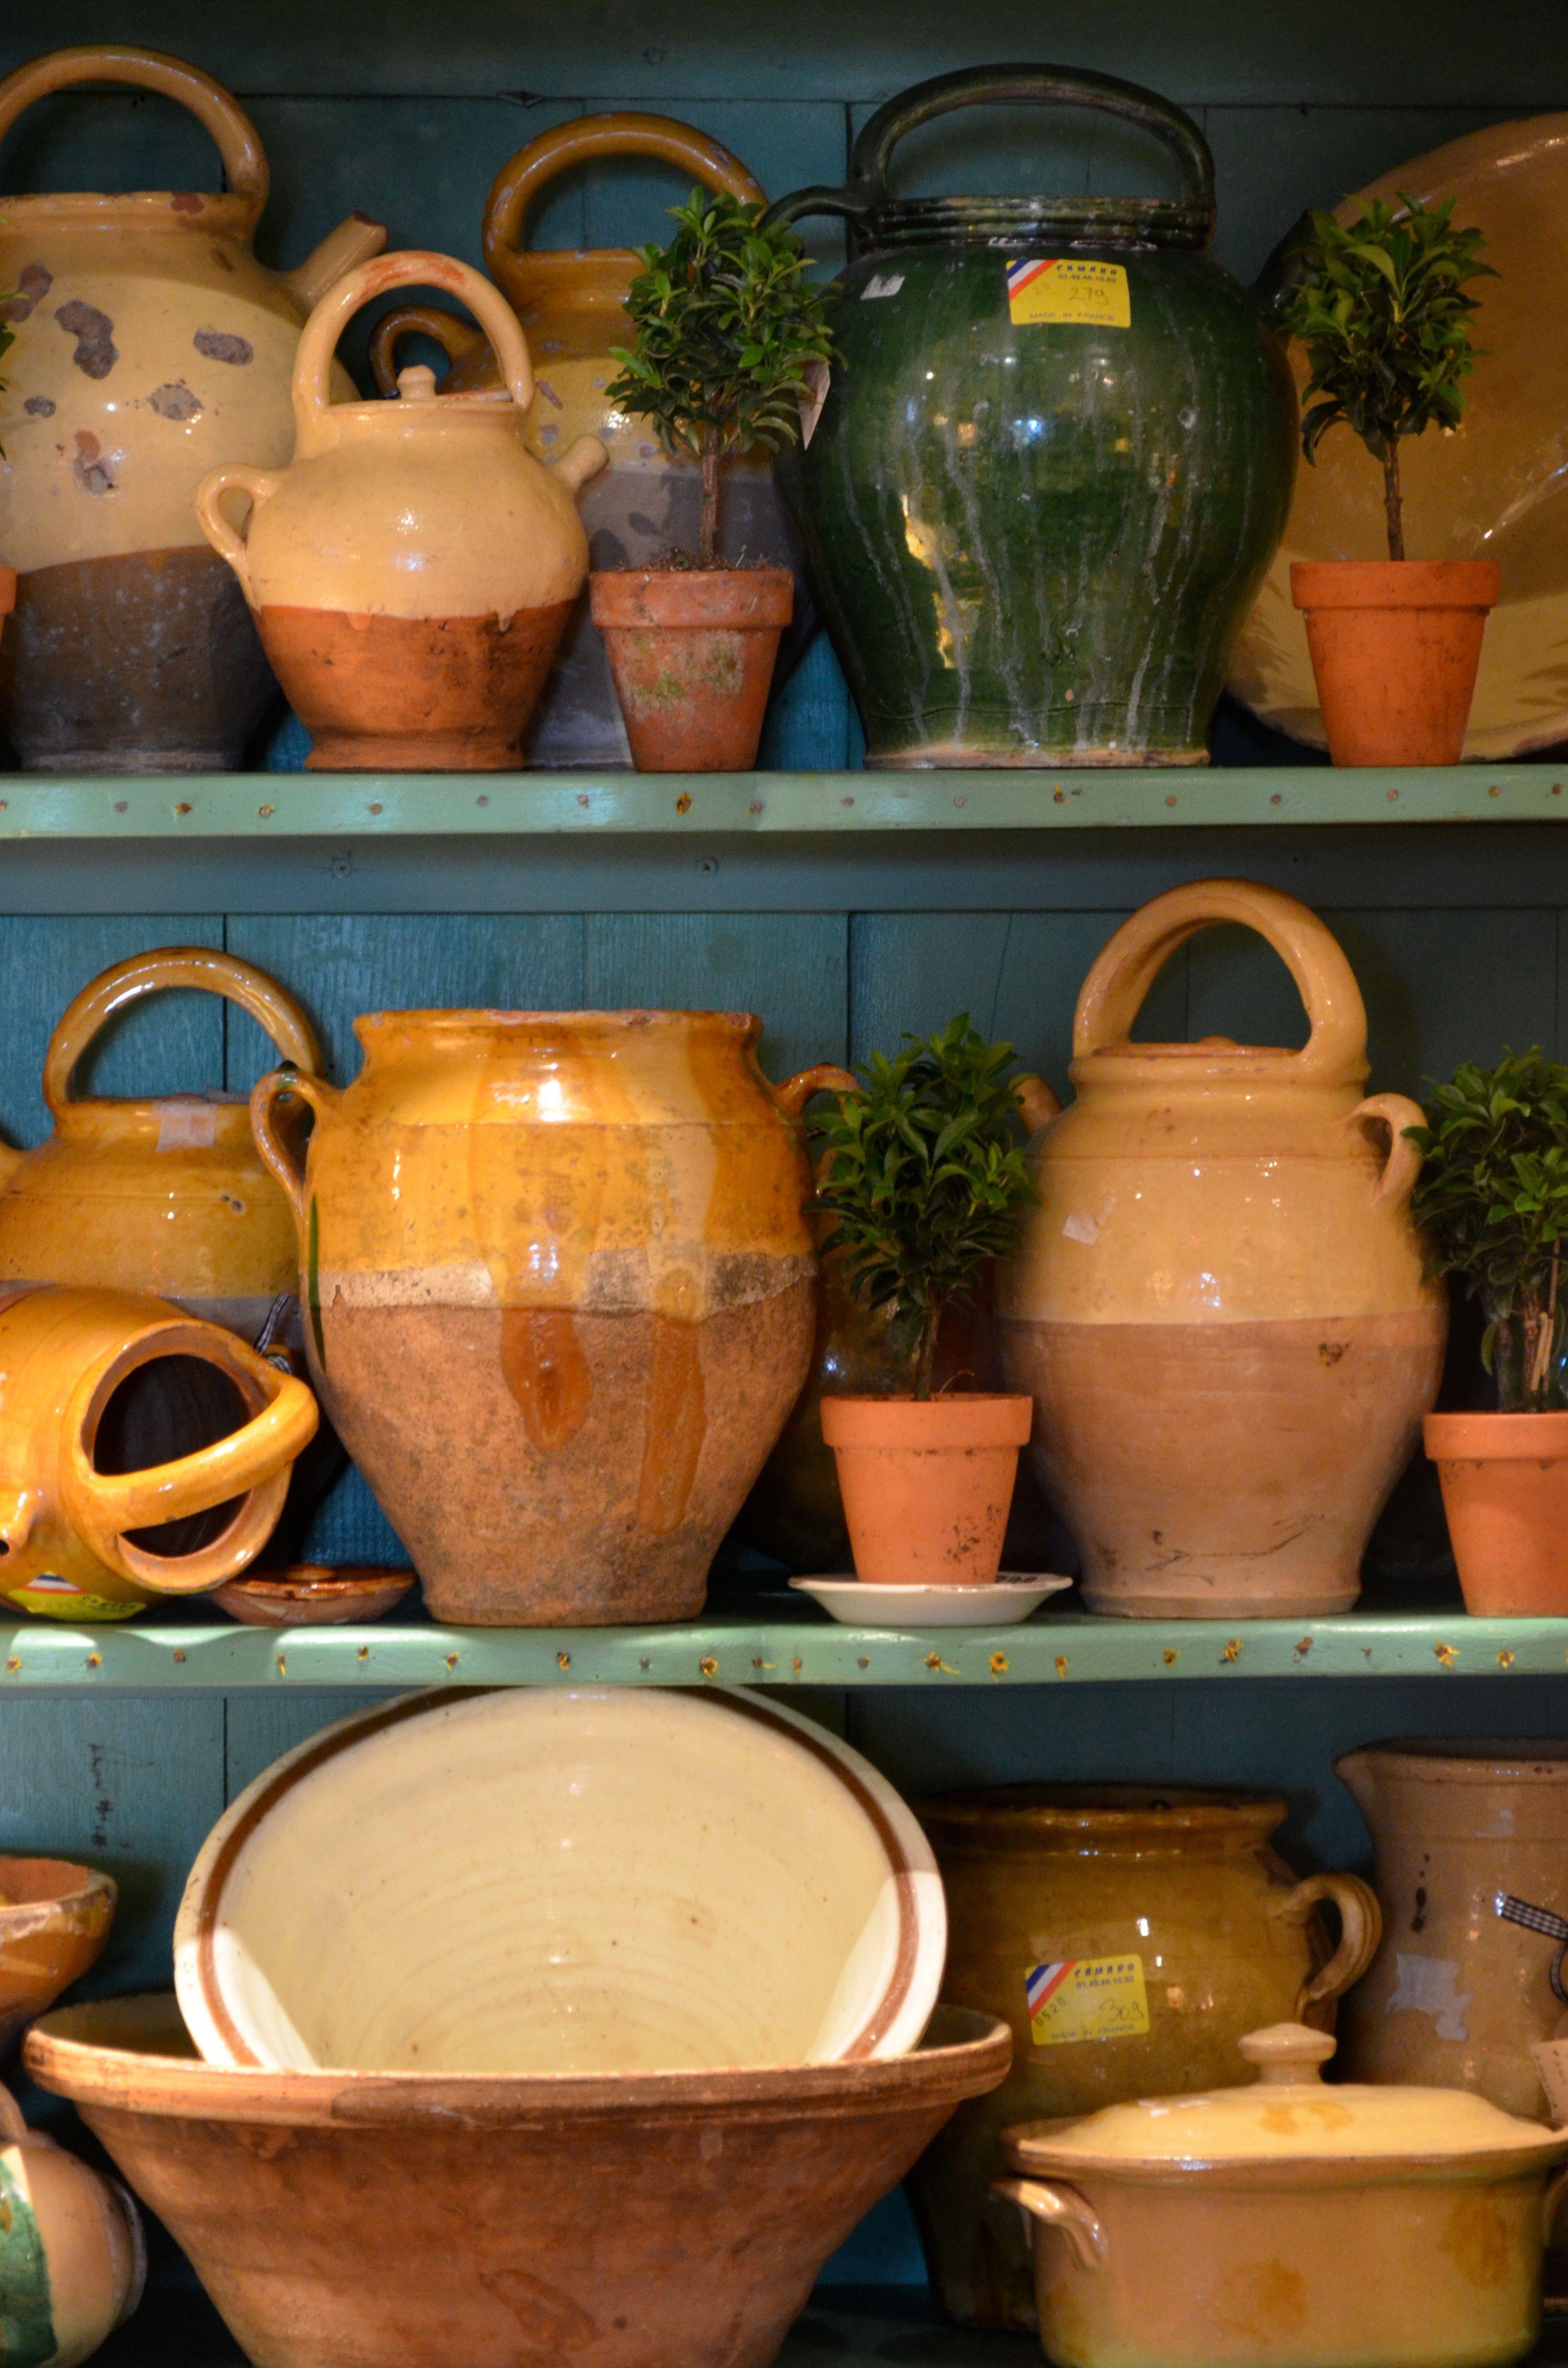 Provencal pottery provance pinterest keramik for Dekoration spanien